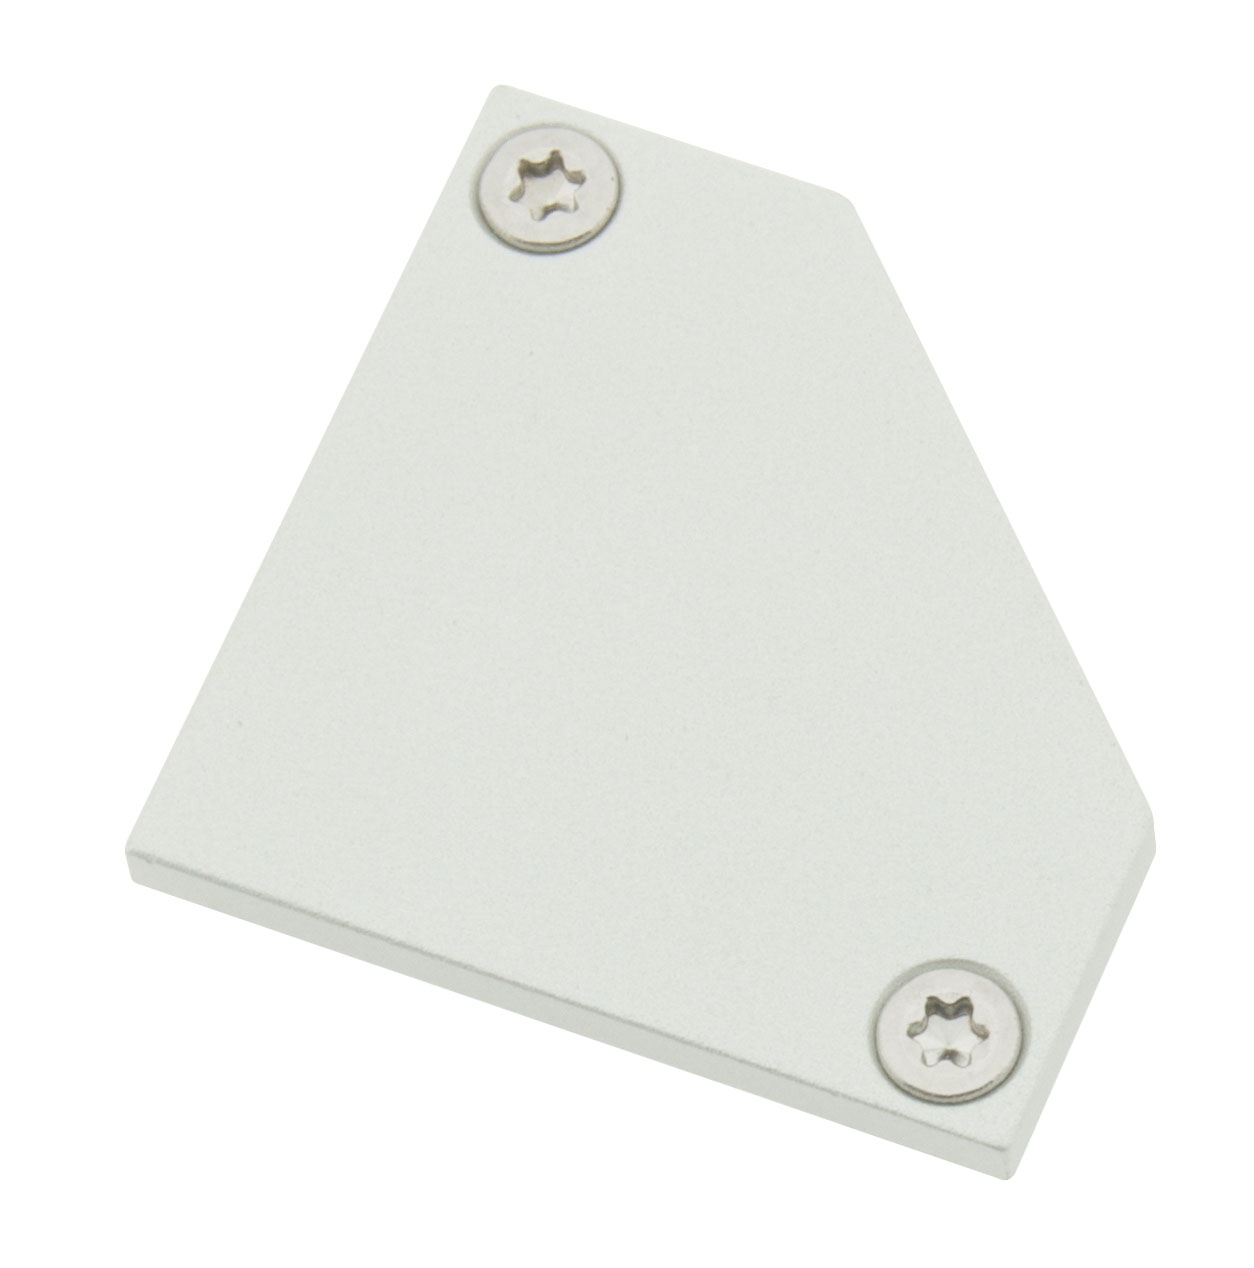 1 Stk Profil Endkappe TBE Flach geschlossen inkl. Schrauben LIEK002600